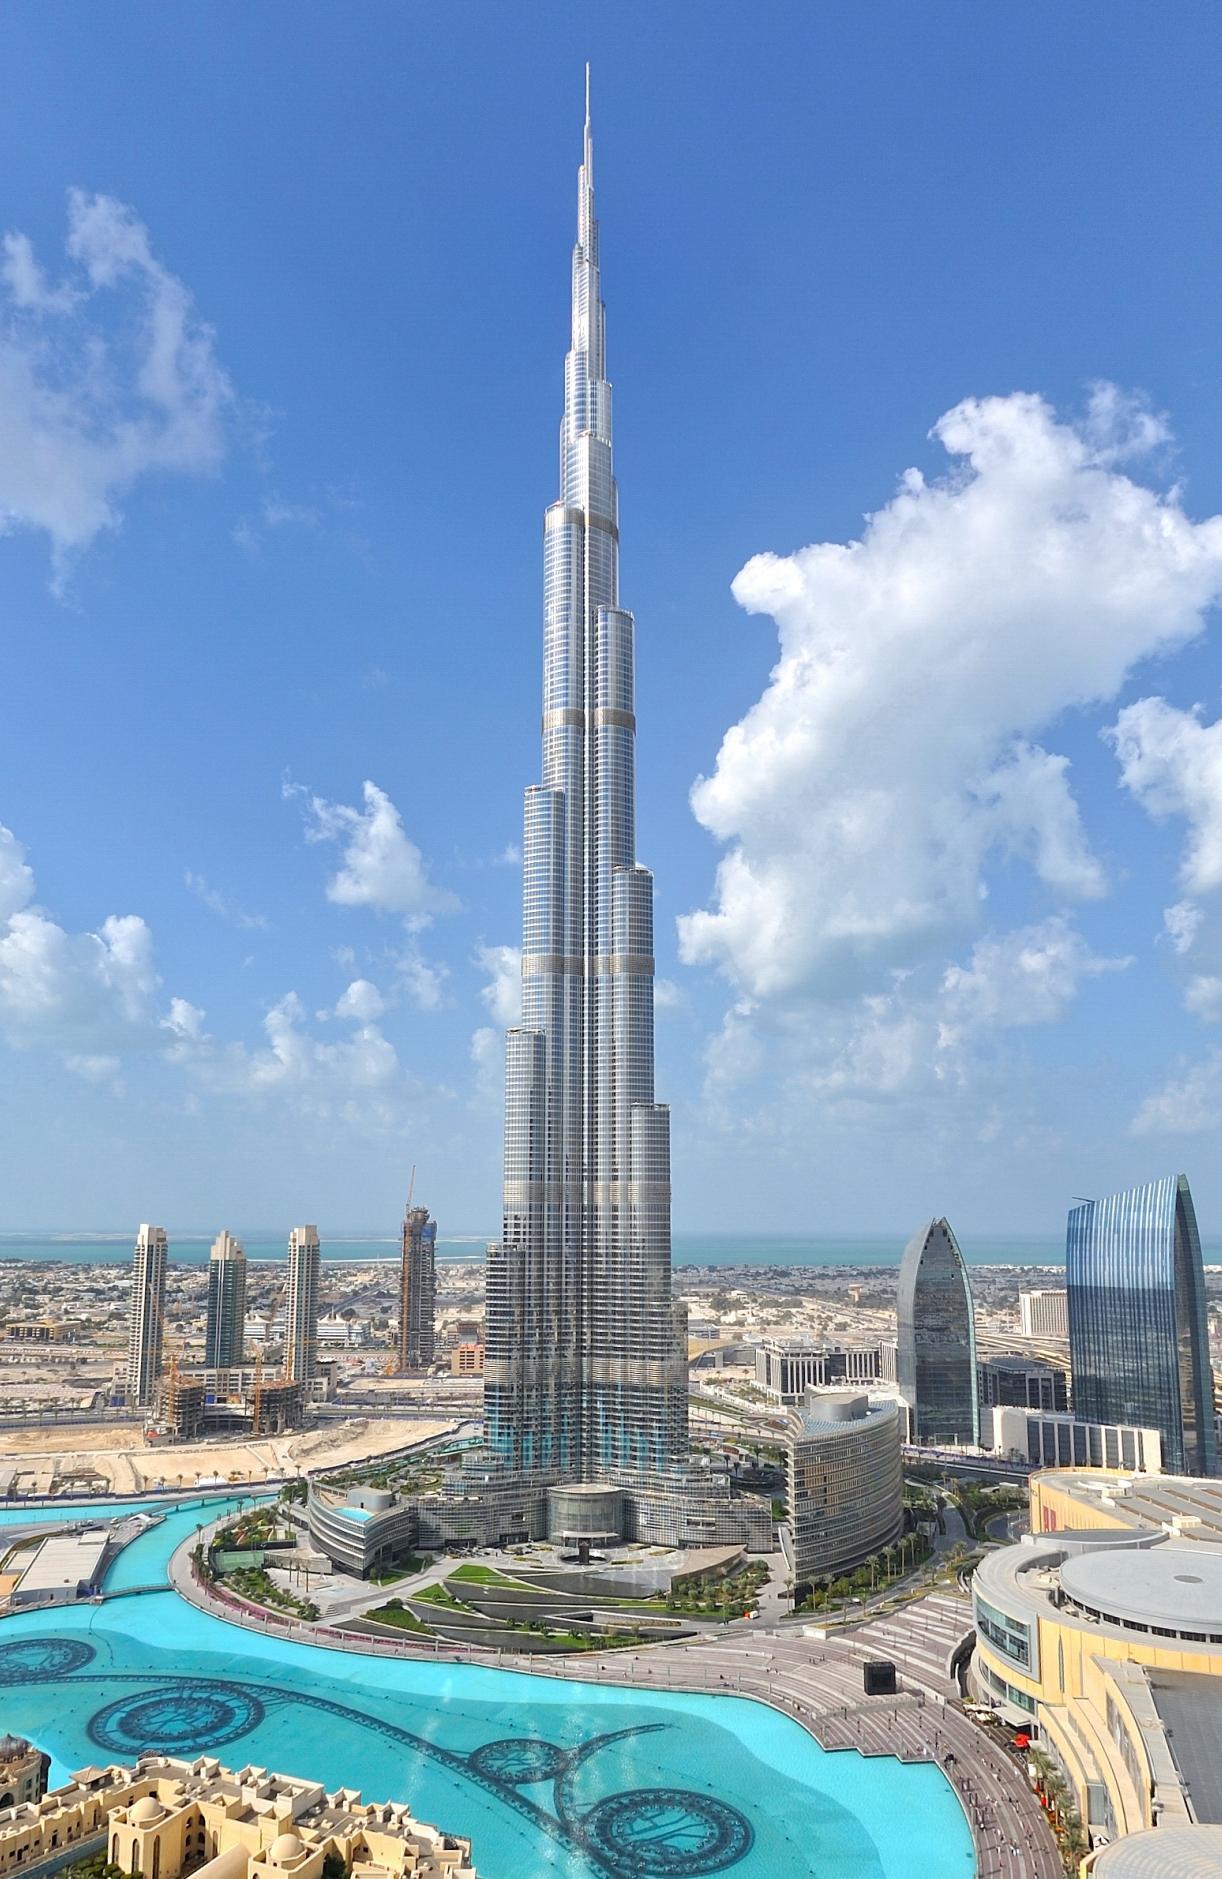 Burj-Khalifa-Hotel-Tallest-Building-In-The-World